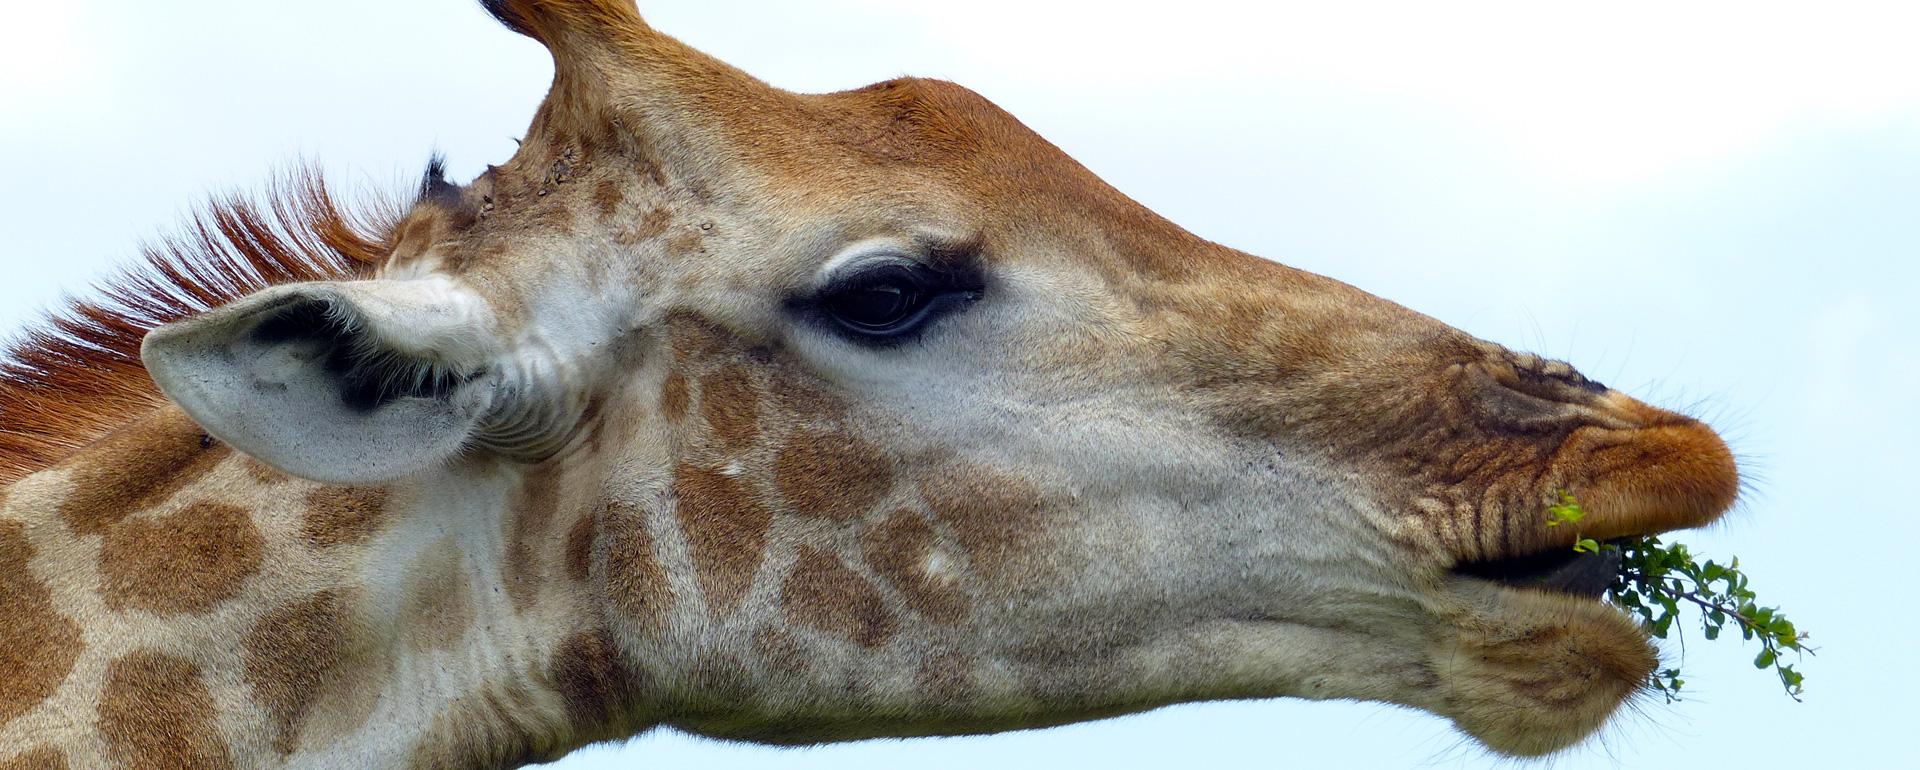 Parc animalier African Safari - Haute-Garonne